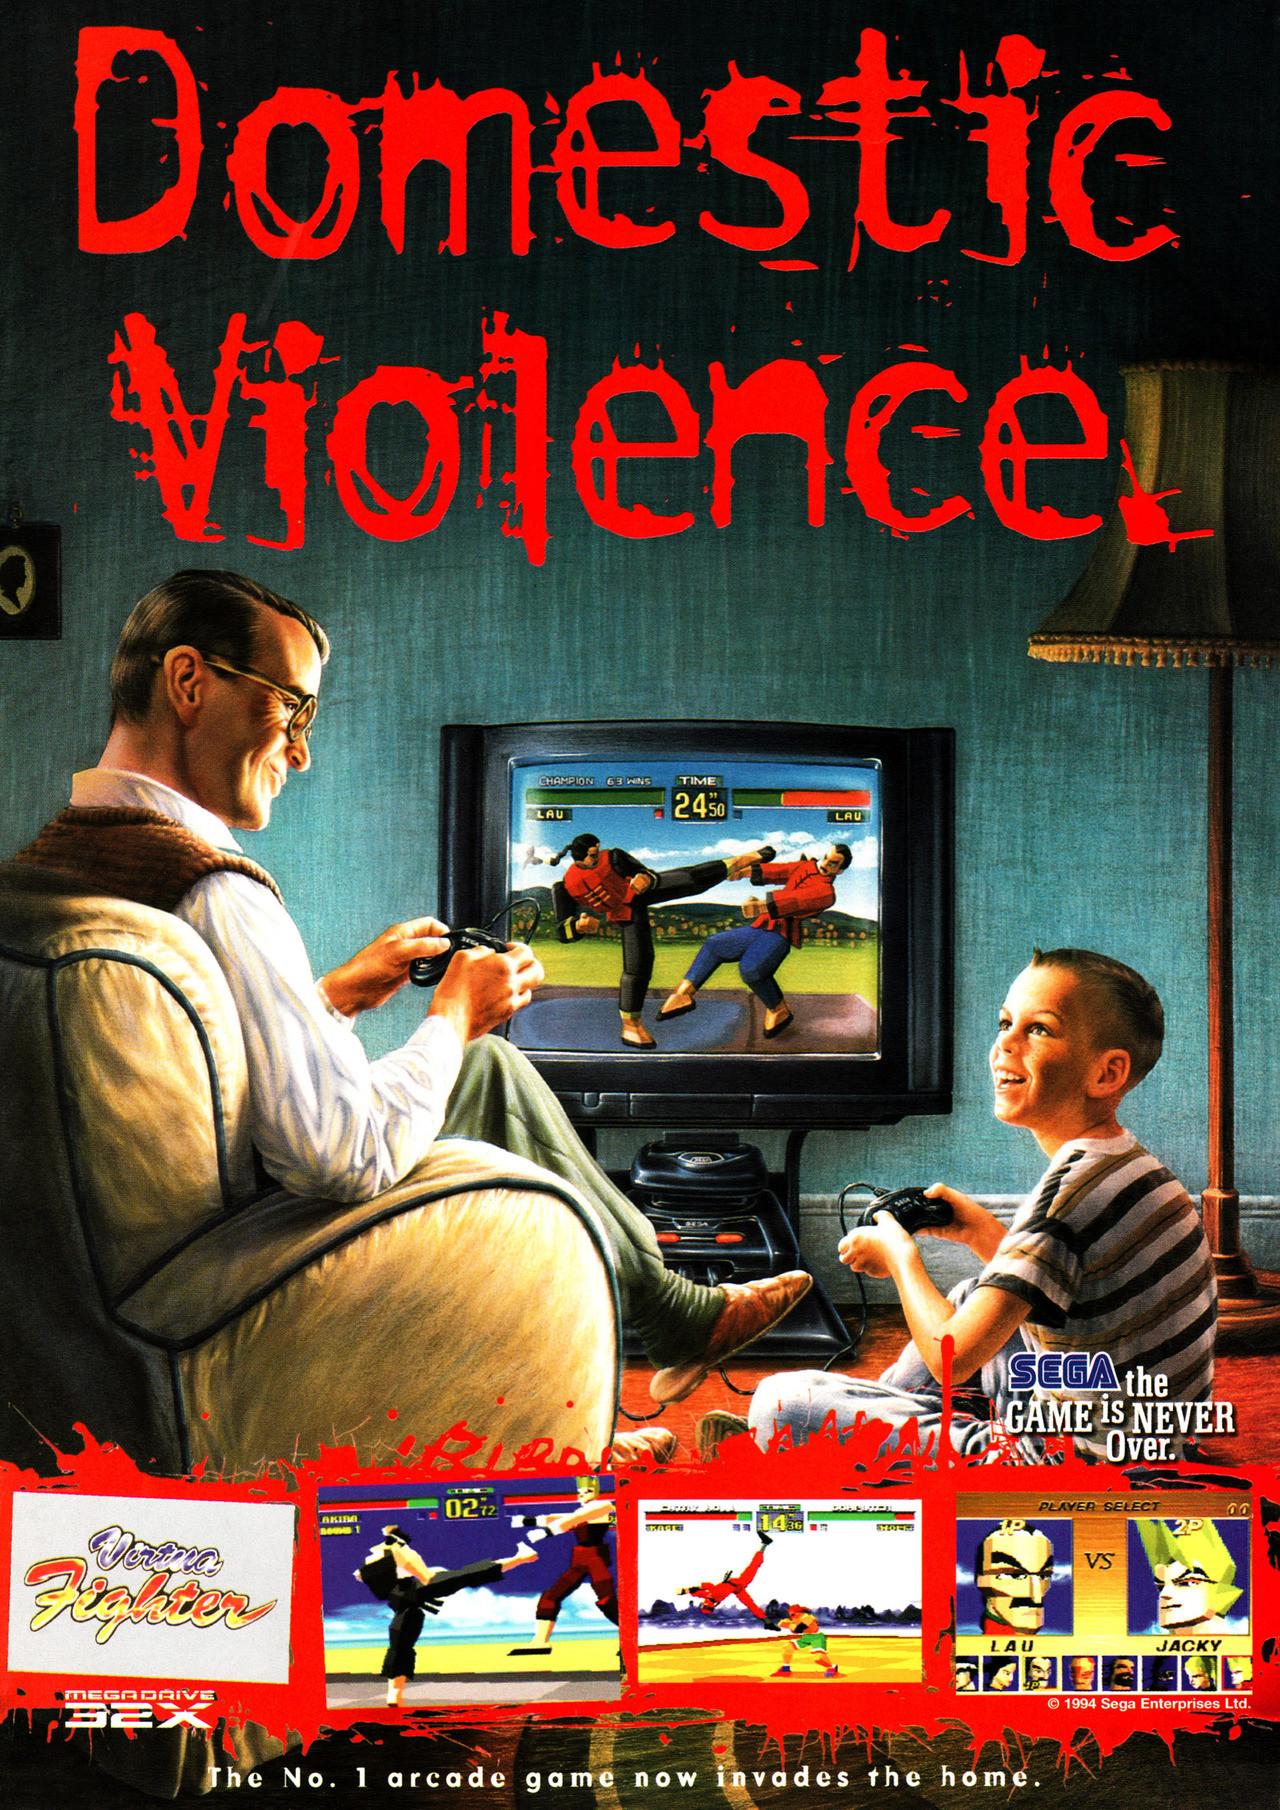 Even nostalgia cant improve these retro games ads - VG247